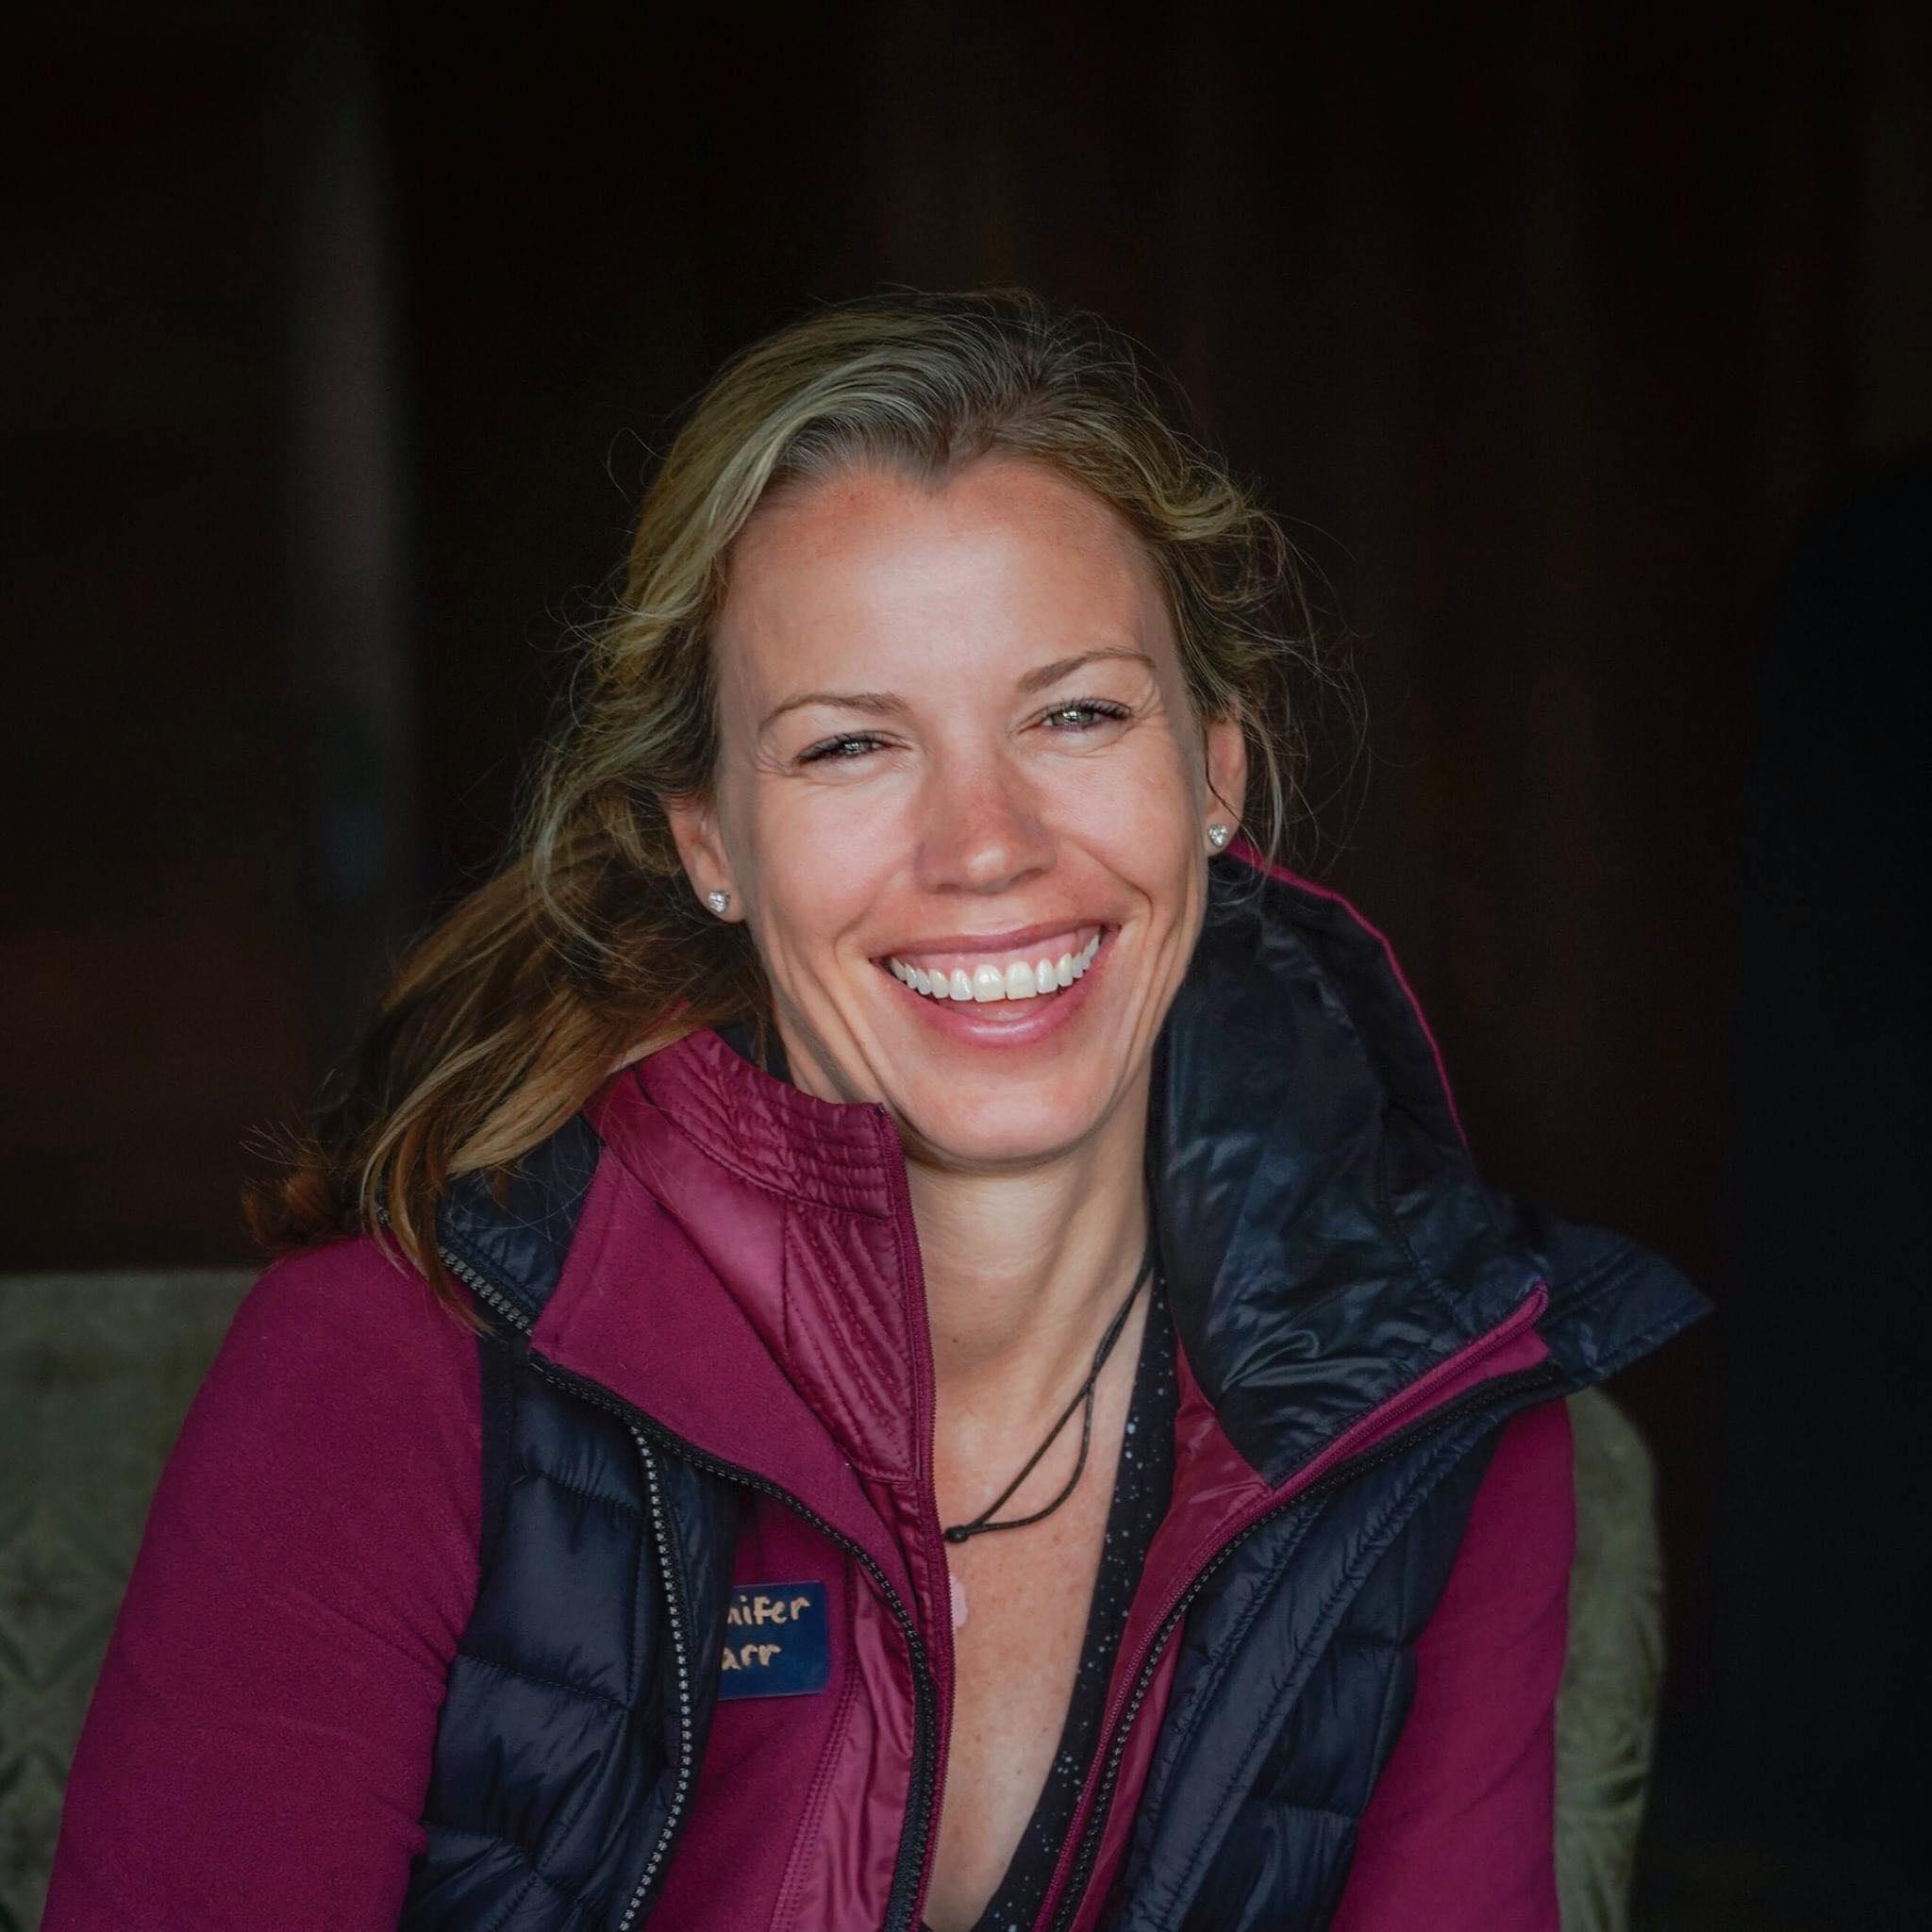 Landscape photographer and educator Jennifer Carr